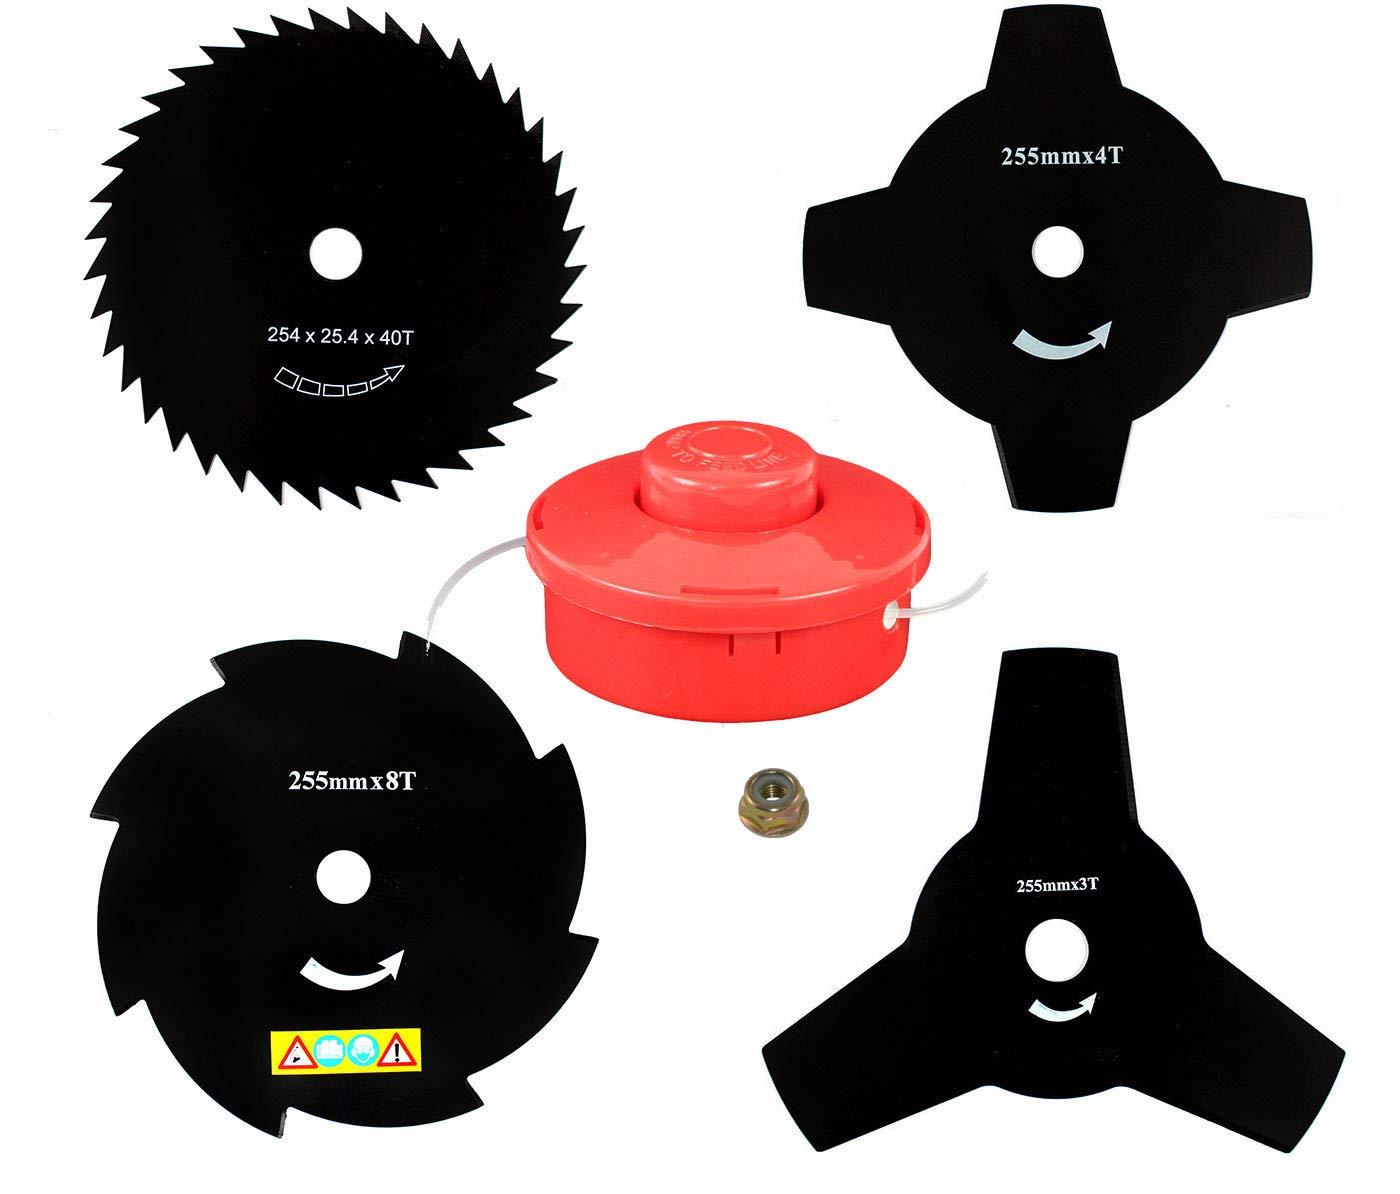 4 x sharfes Cuchillo & Bobina de hilo para compatible con: Fuxtec ...